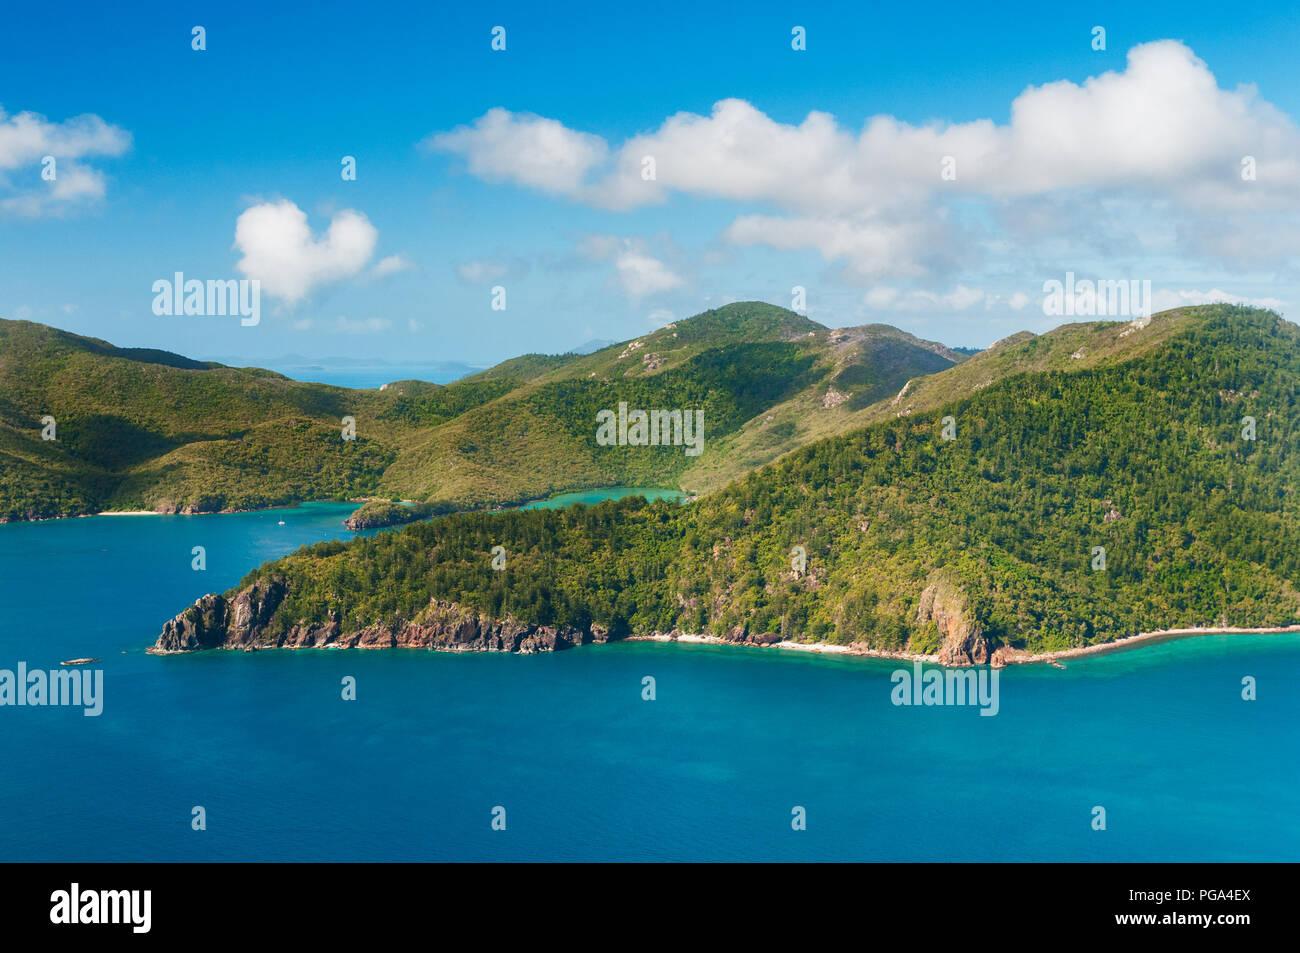 Beautiful Hook Island in the famous Whitsundays. - Stock Image